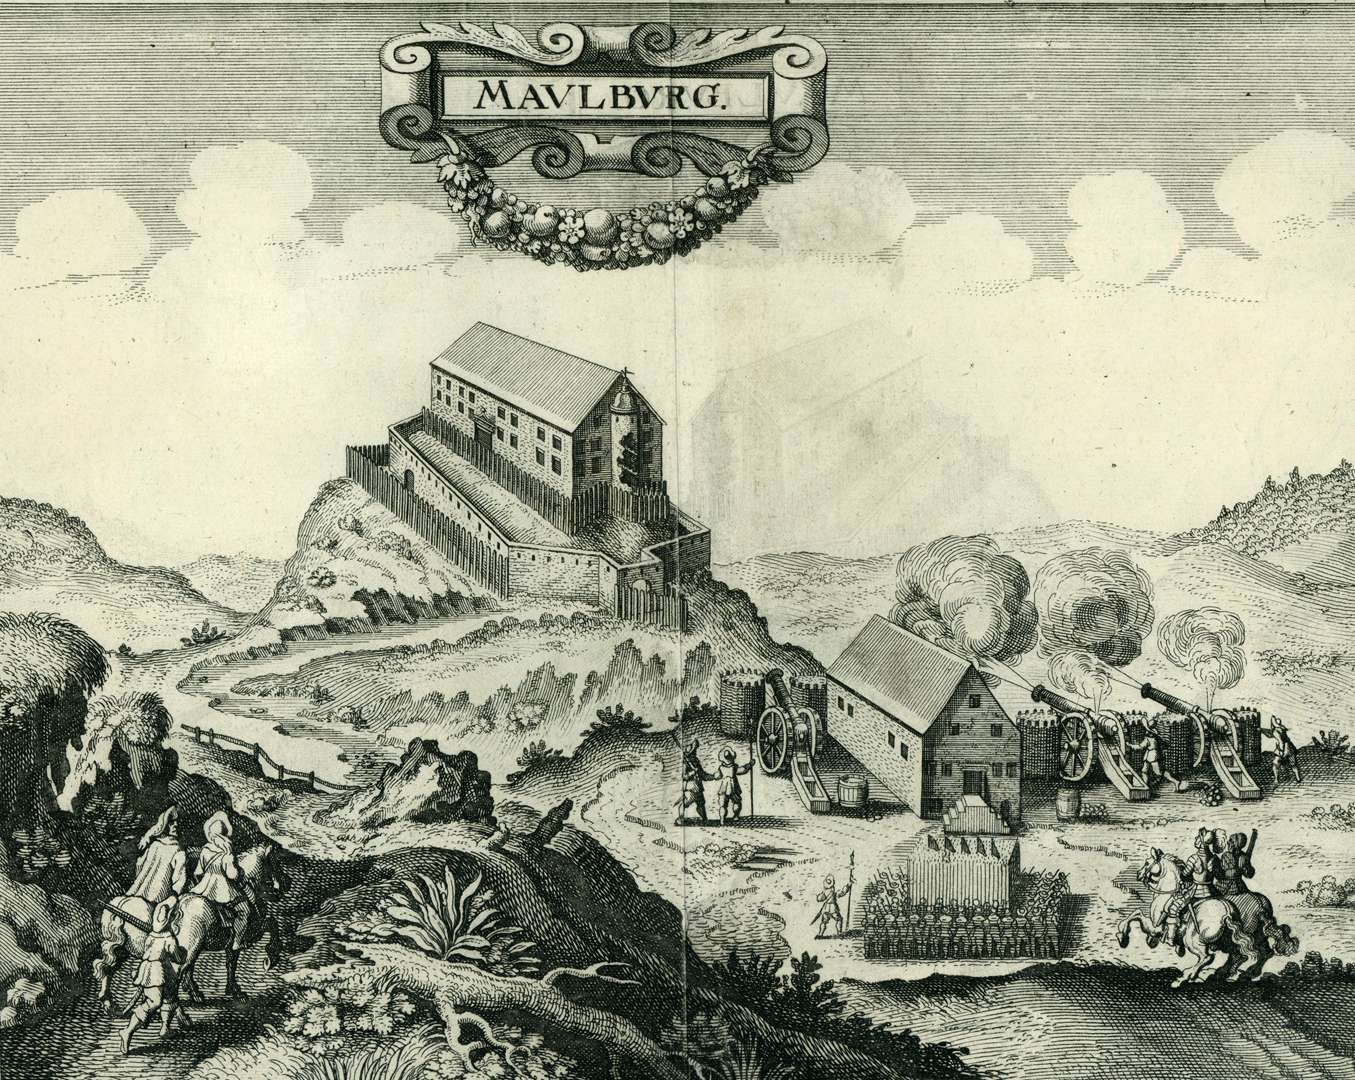 Maulburg, Bild 1